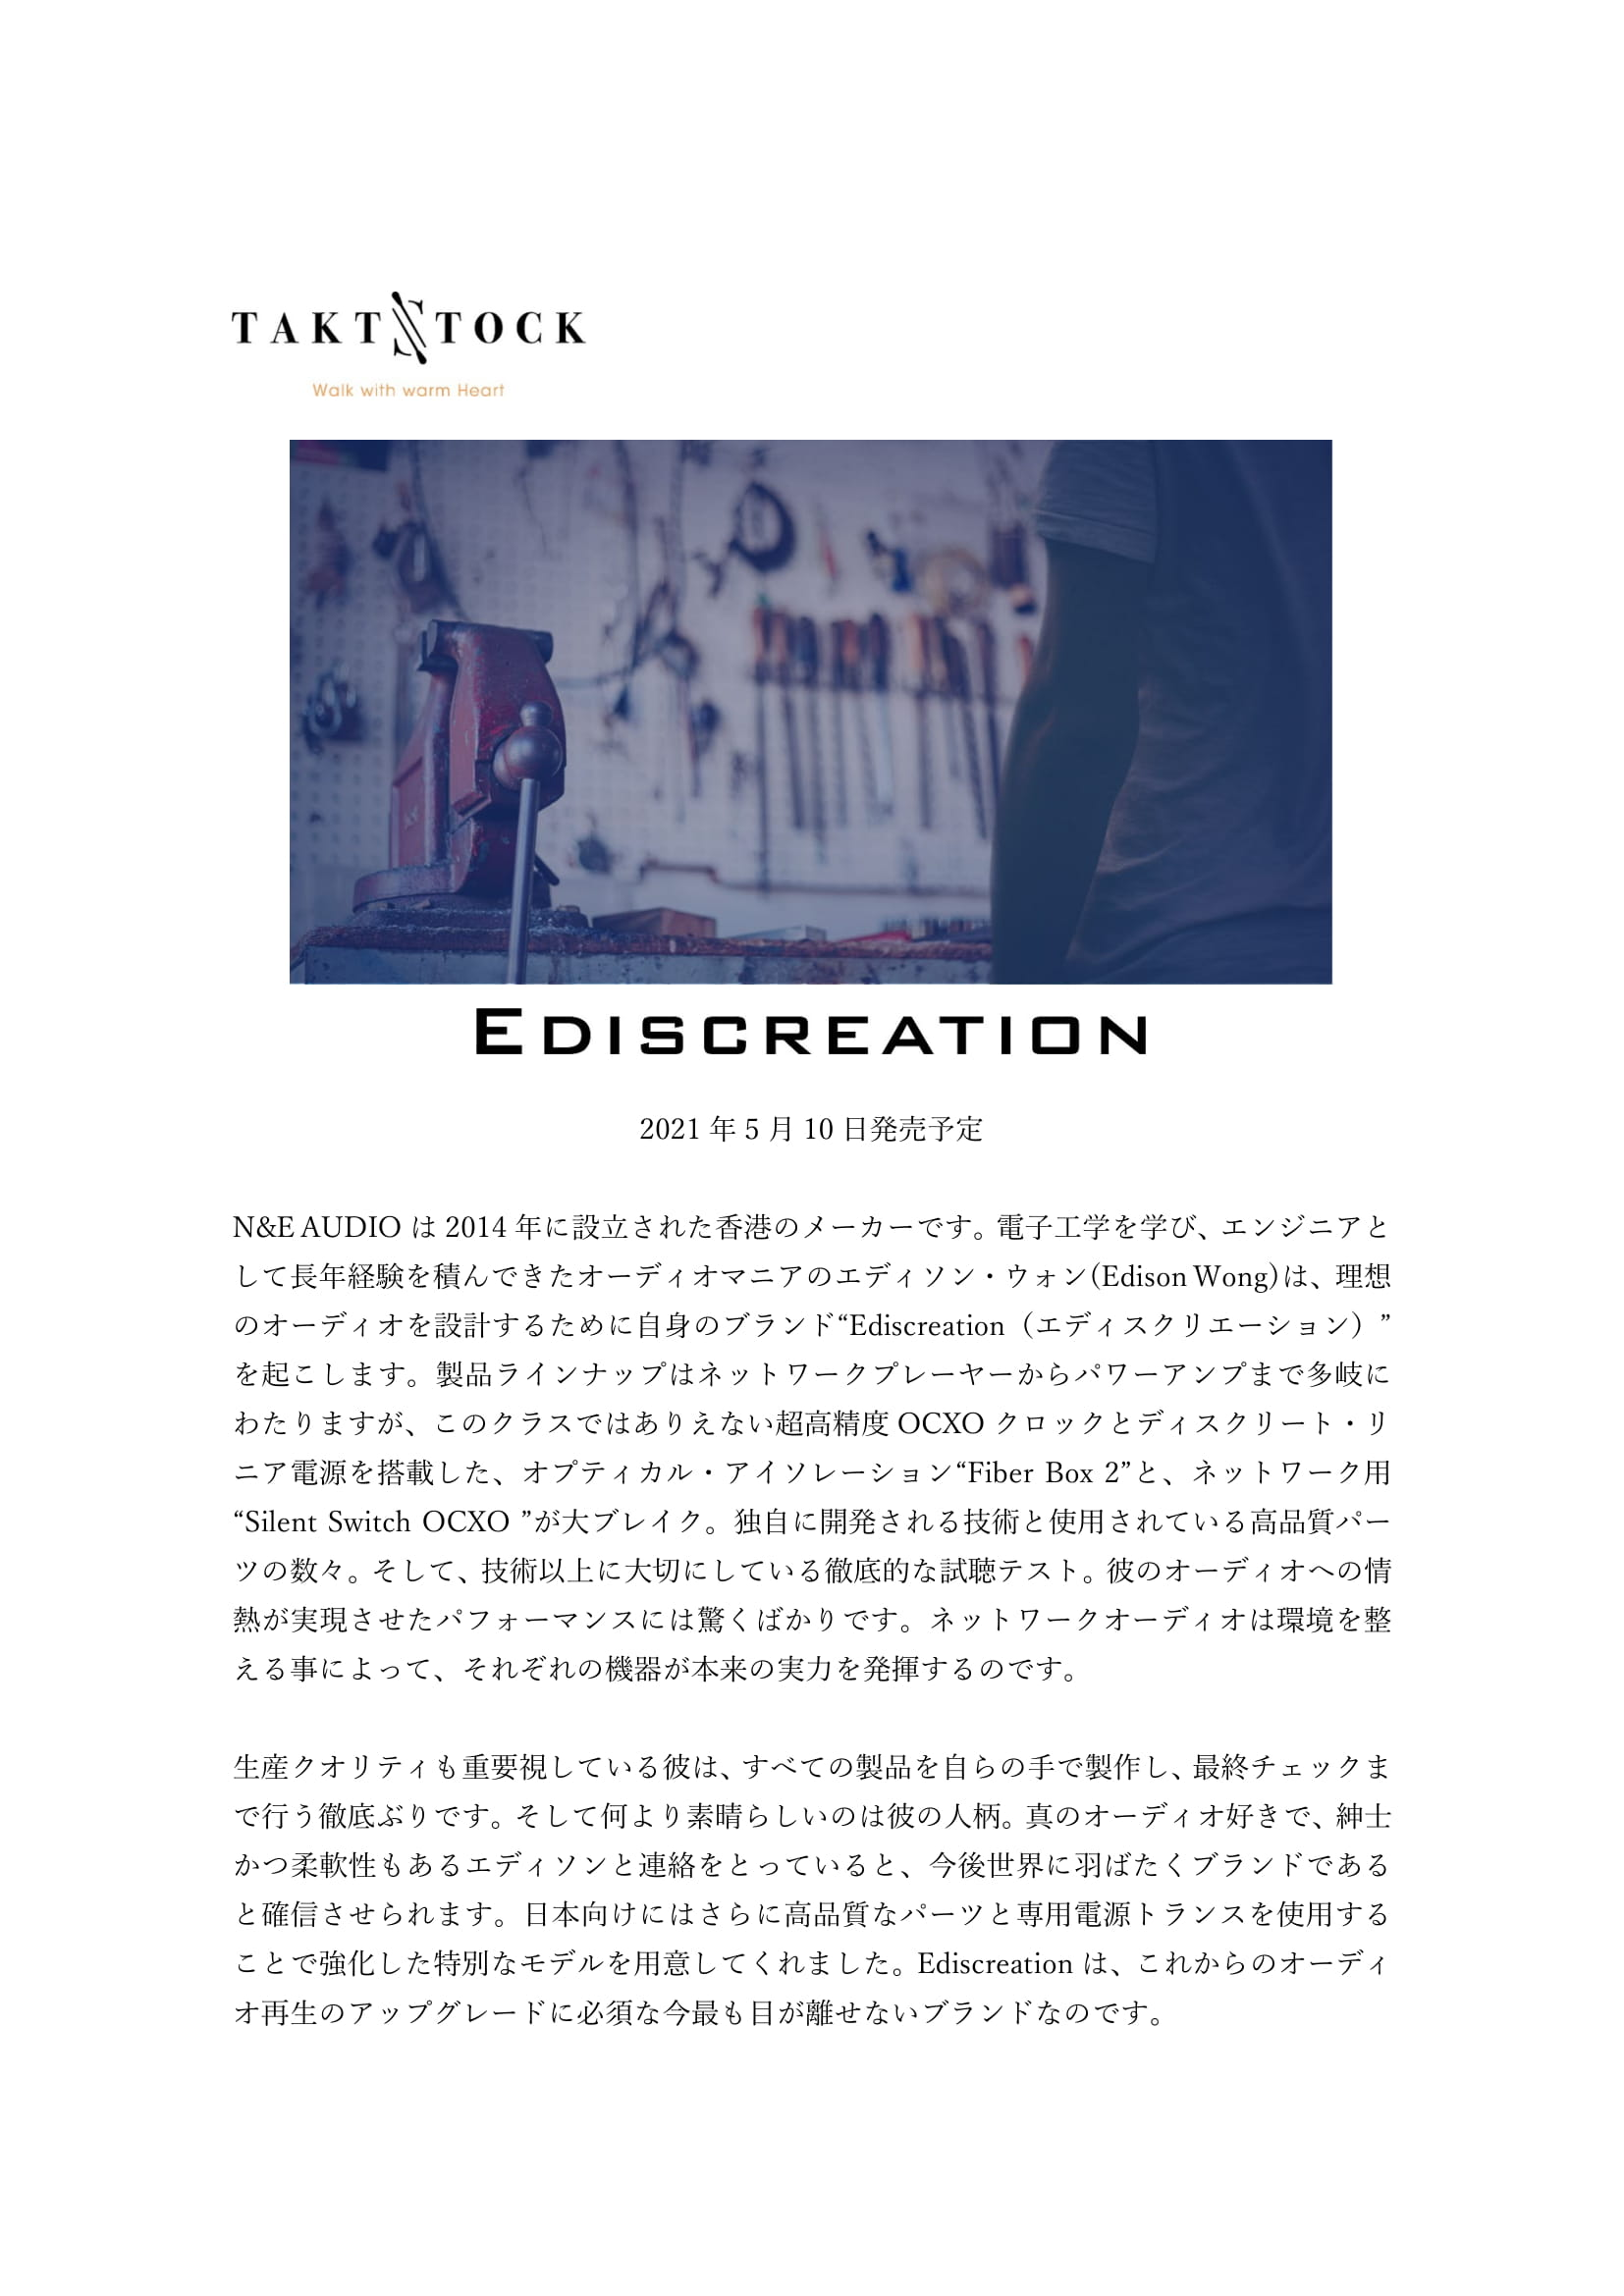 Ediscreation FB2 _ SS _製品資料20210325-1